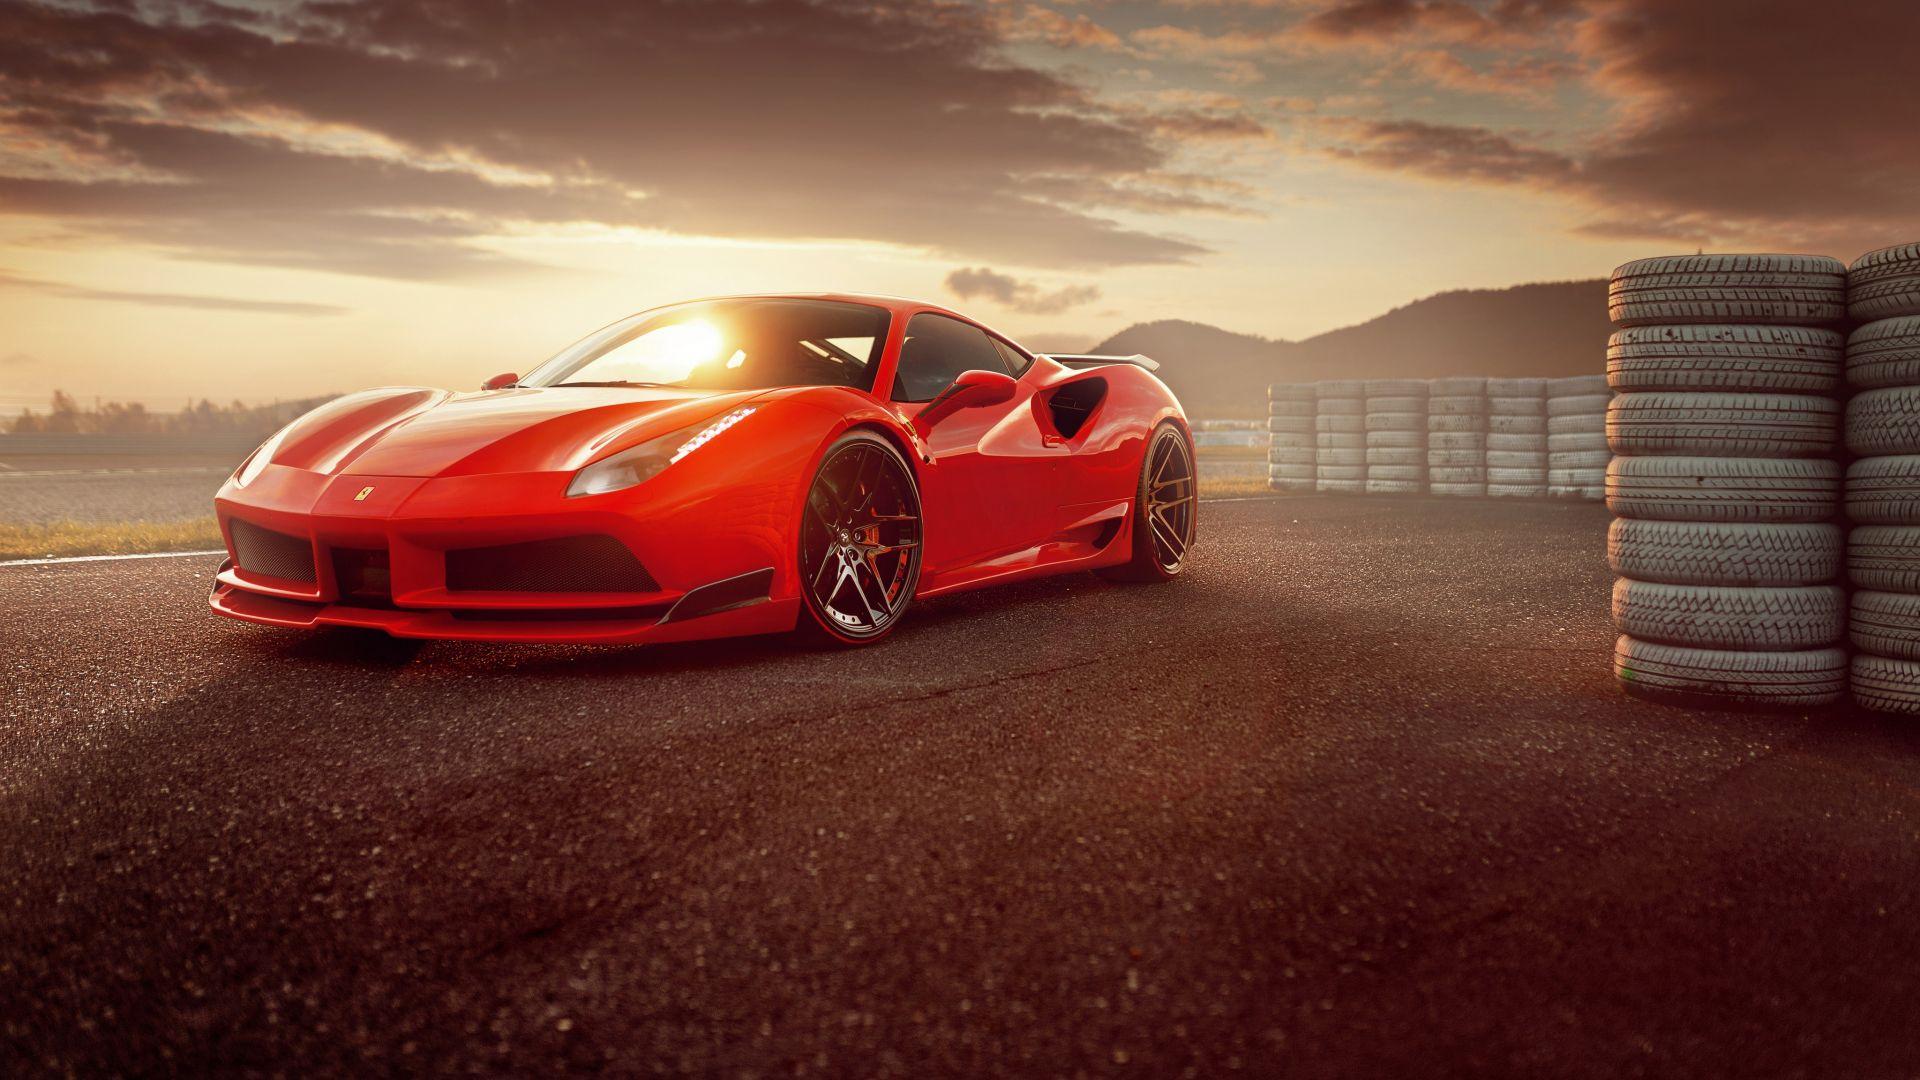 Wallpaper Ferrari 488 GTB, red sports car